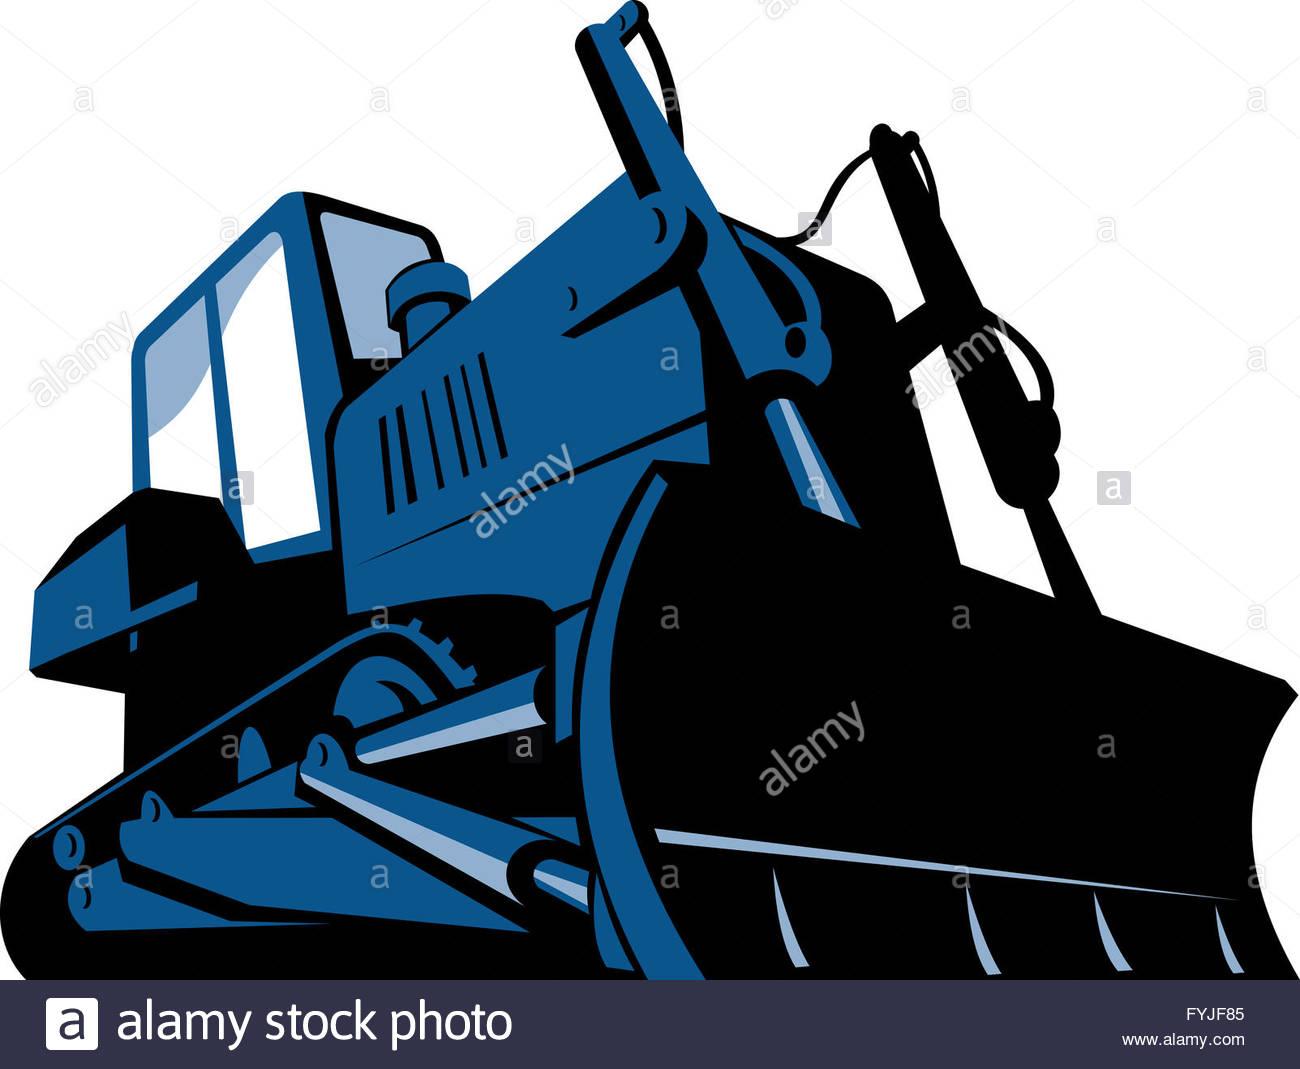 1300x1069 Bulldozer Front Retro Stock Photo, Royalty Free Image 103054677